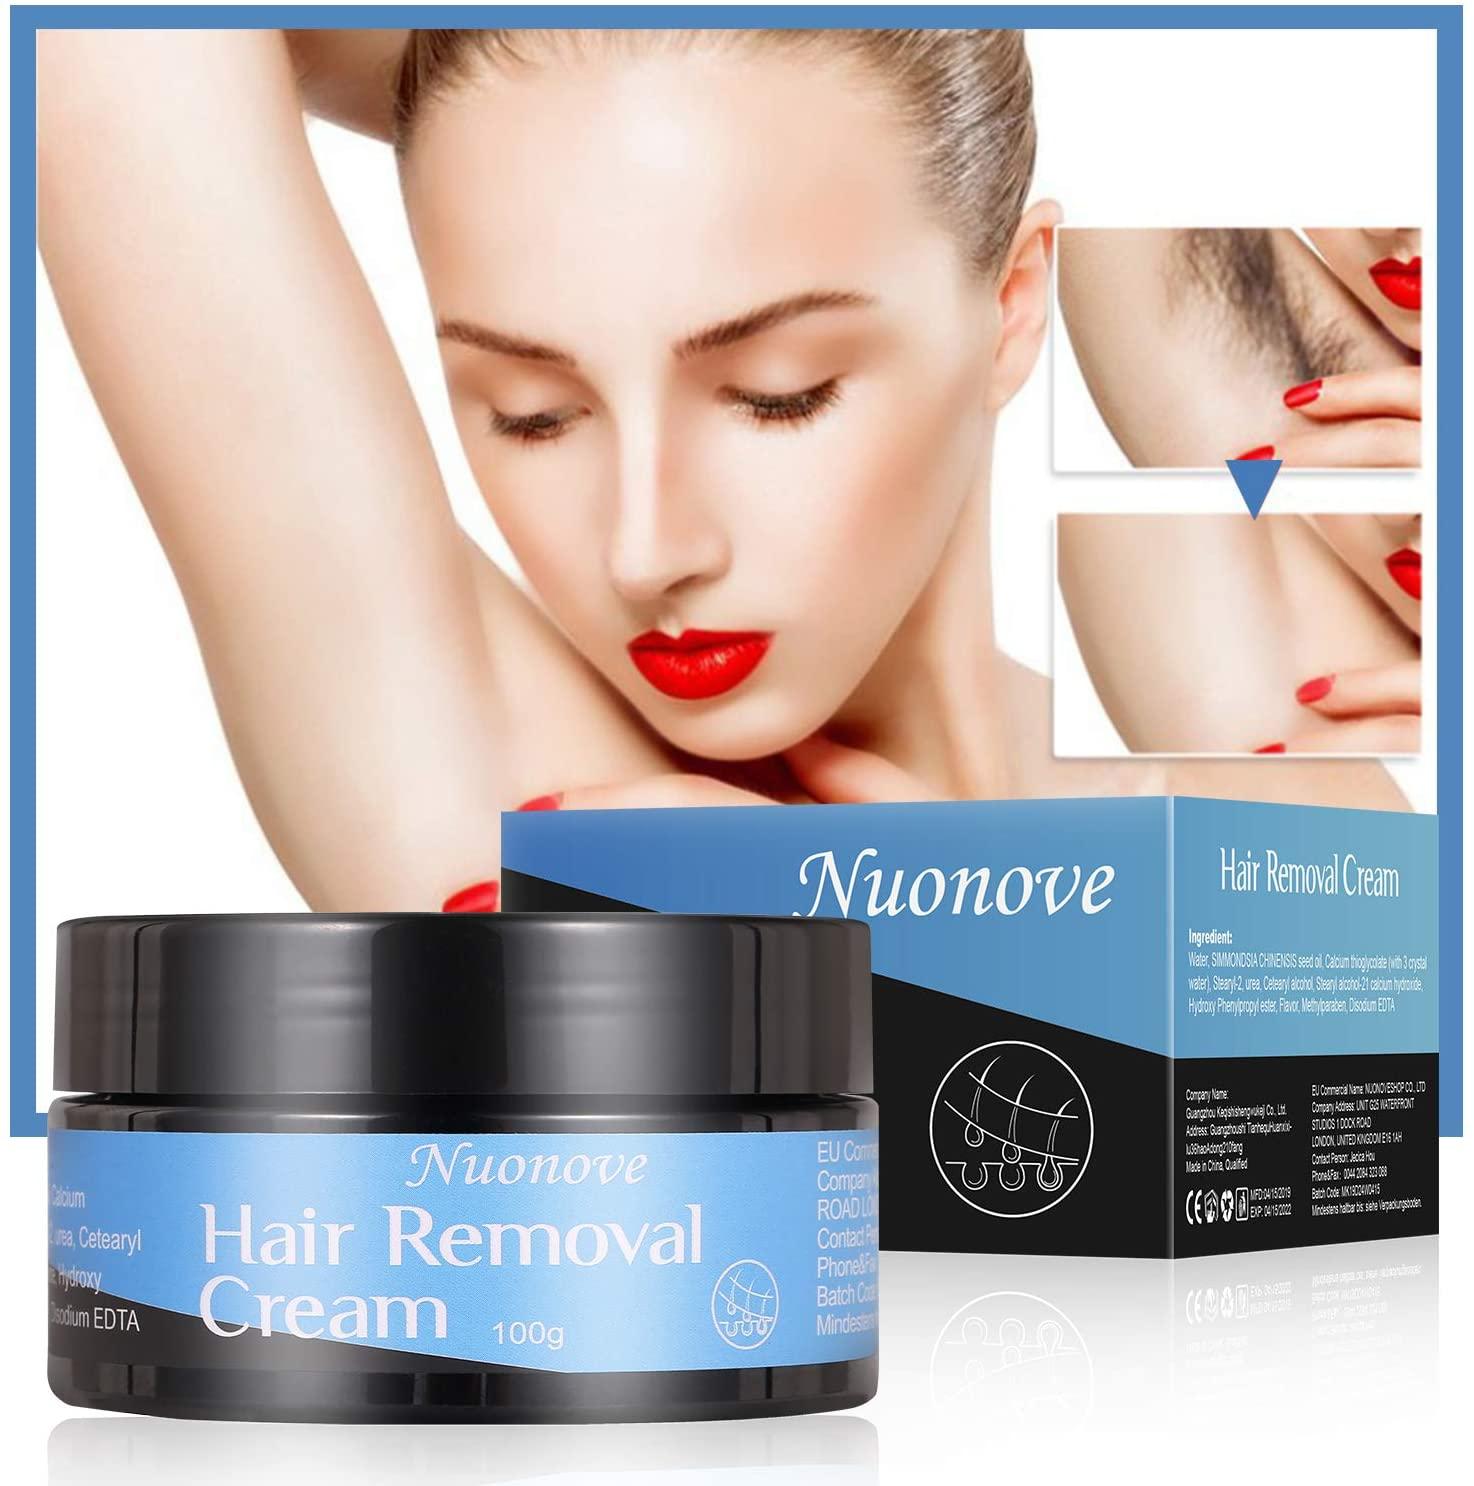 Hair Removal Cream crema depilatoria